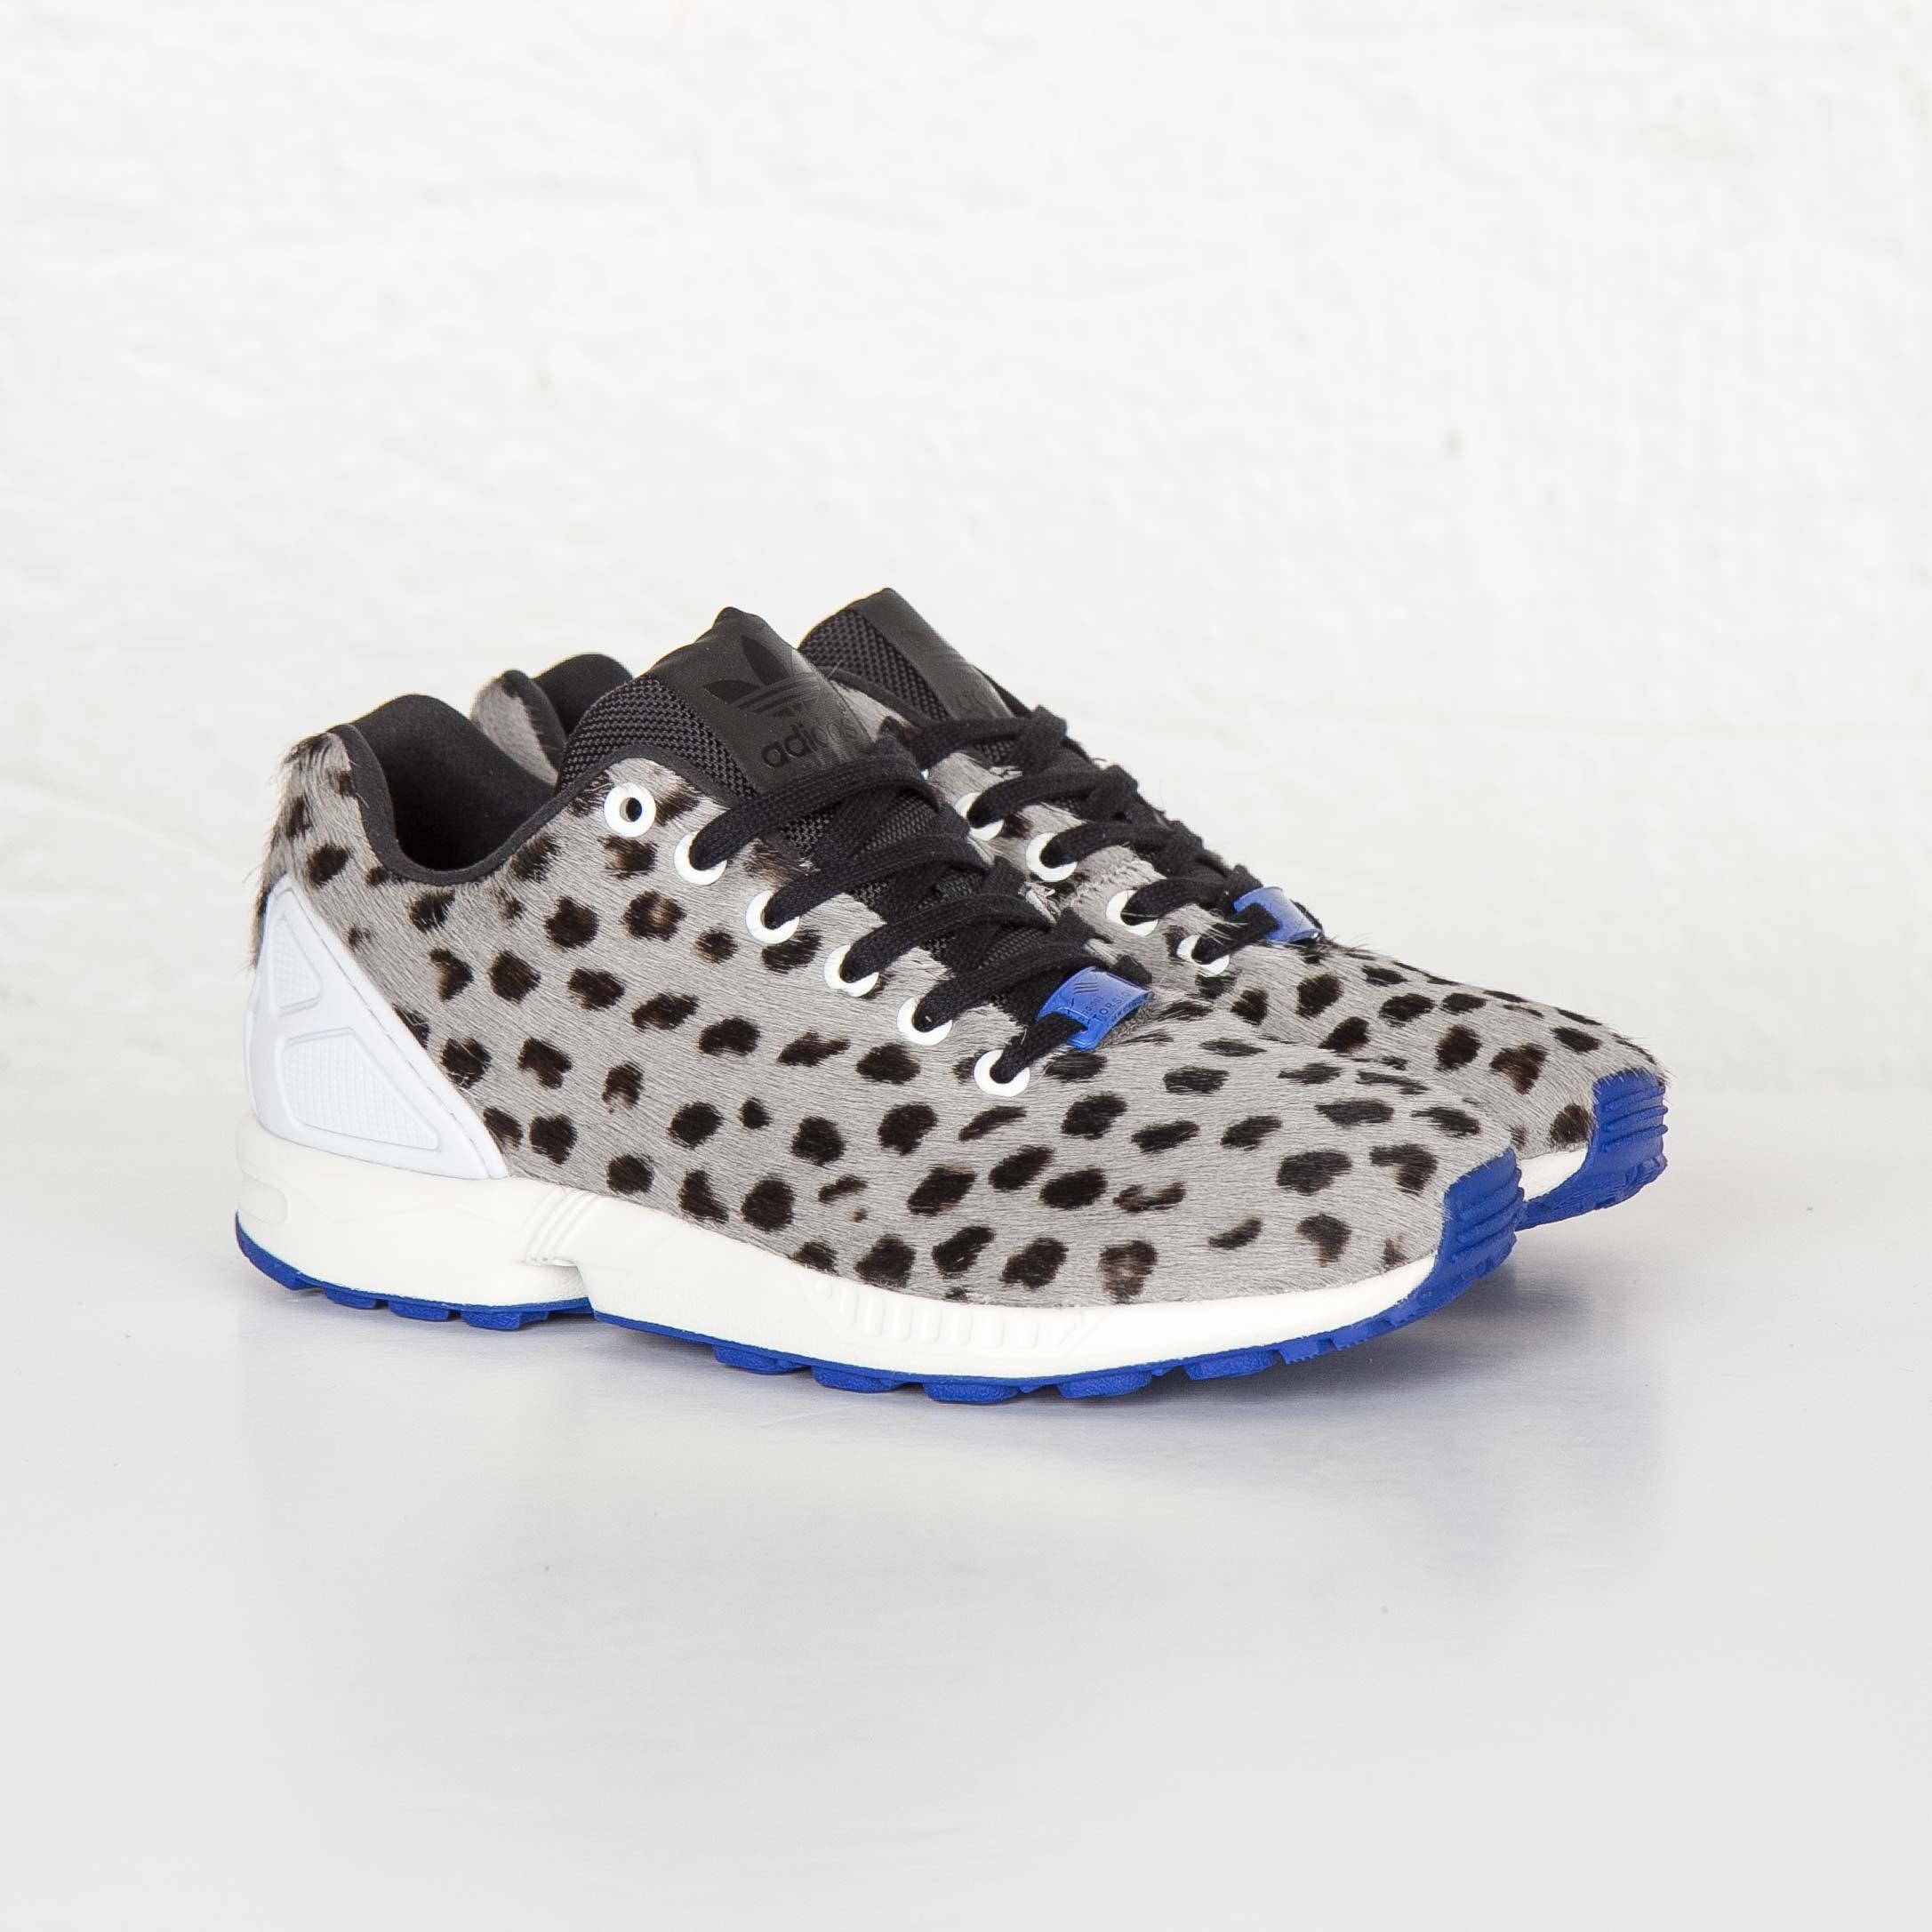 adidas zx flux s79084 sneakersnstuff turnschuhe und streetwear